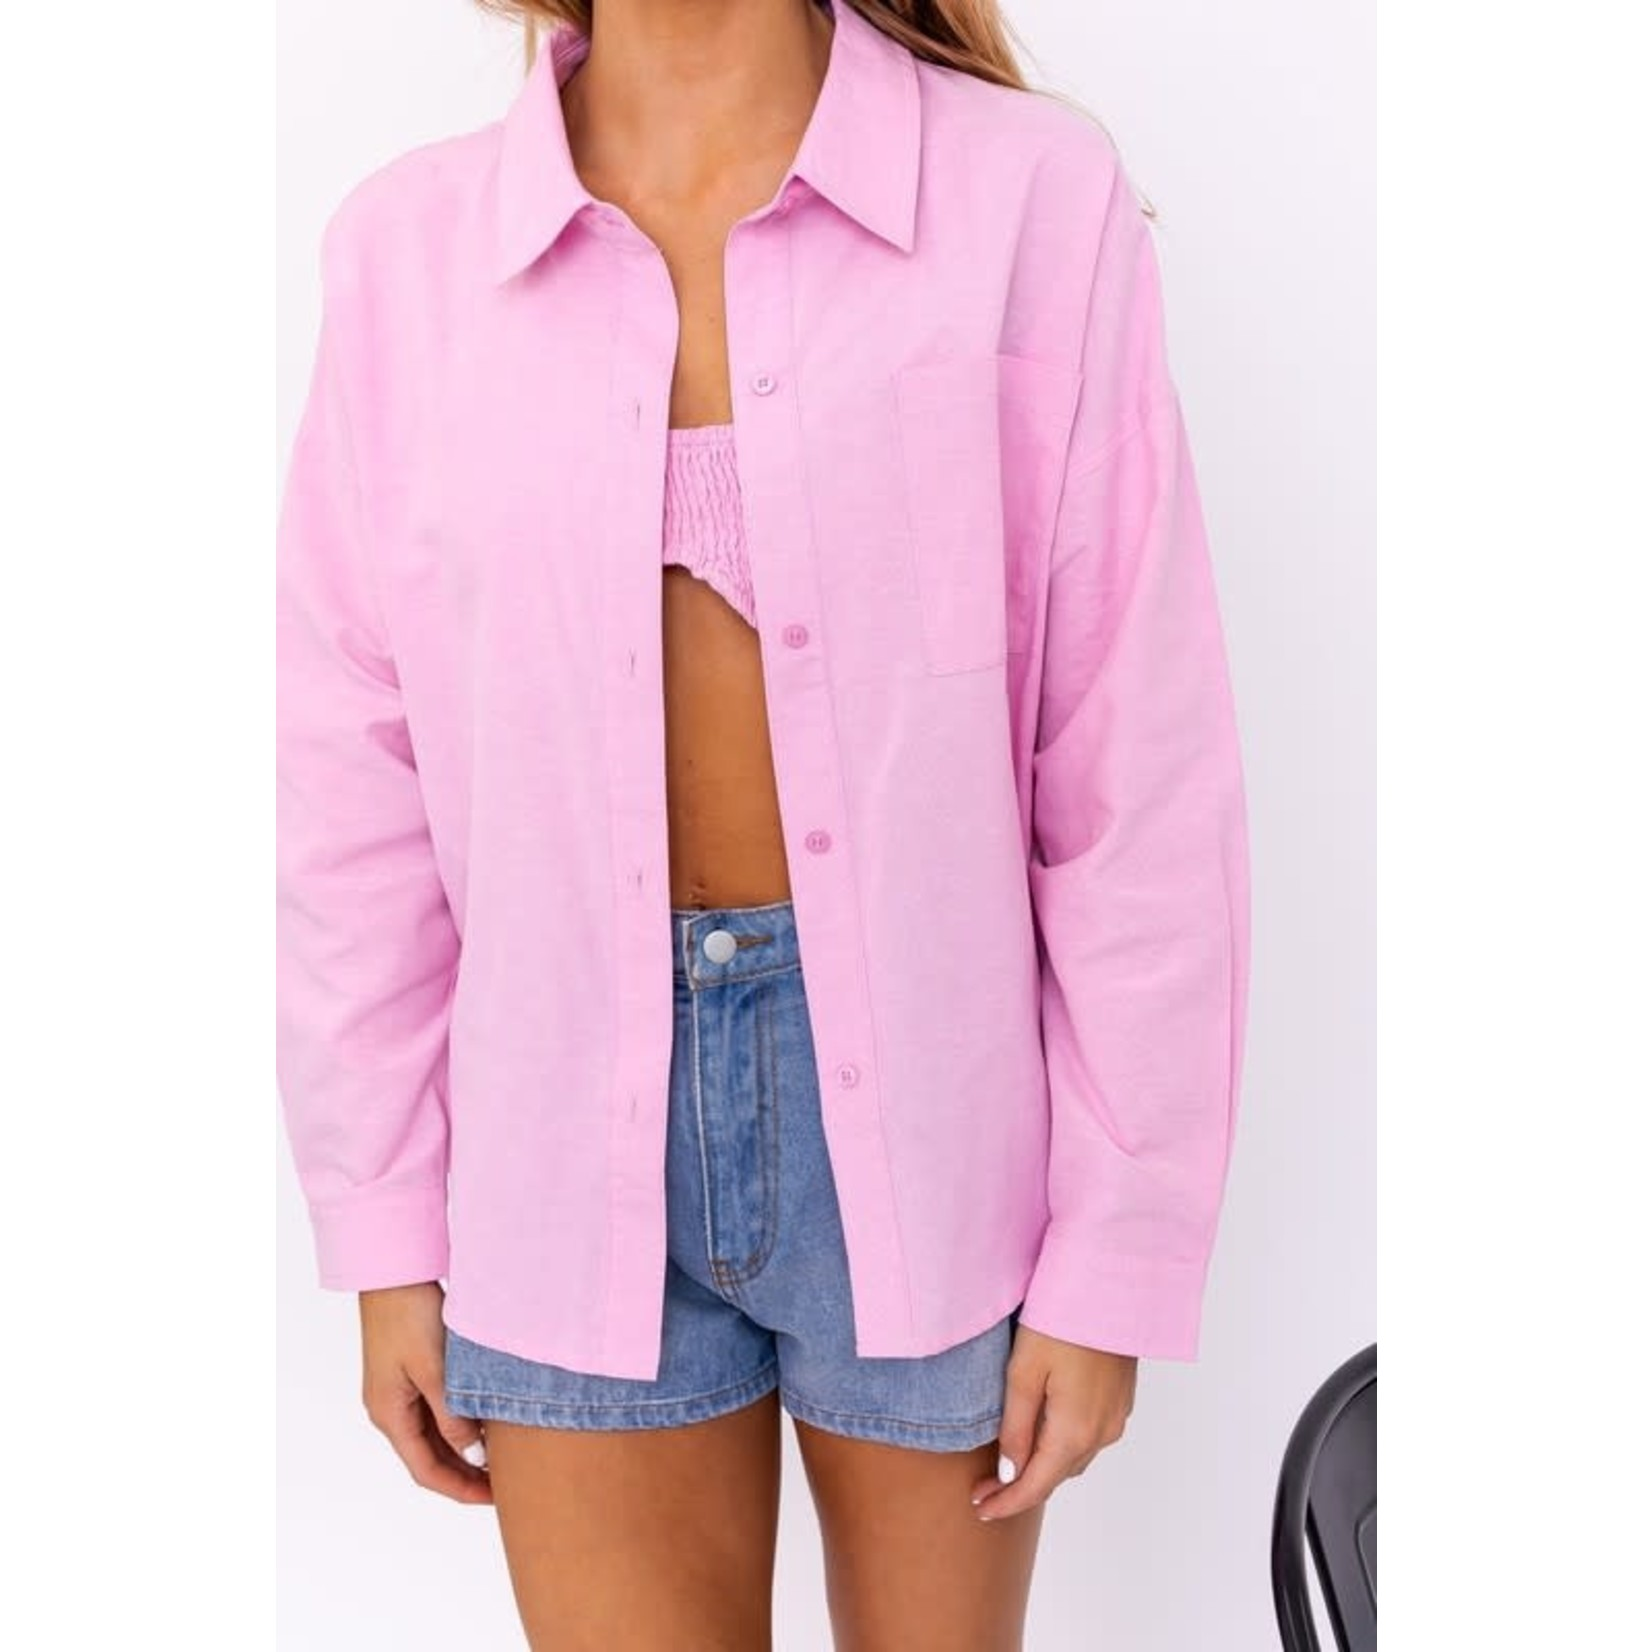 EM & ELLE Bianca Oversized Button Down Shirt